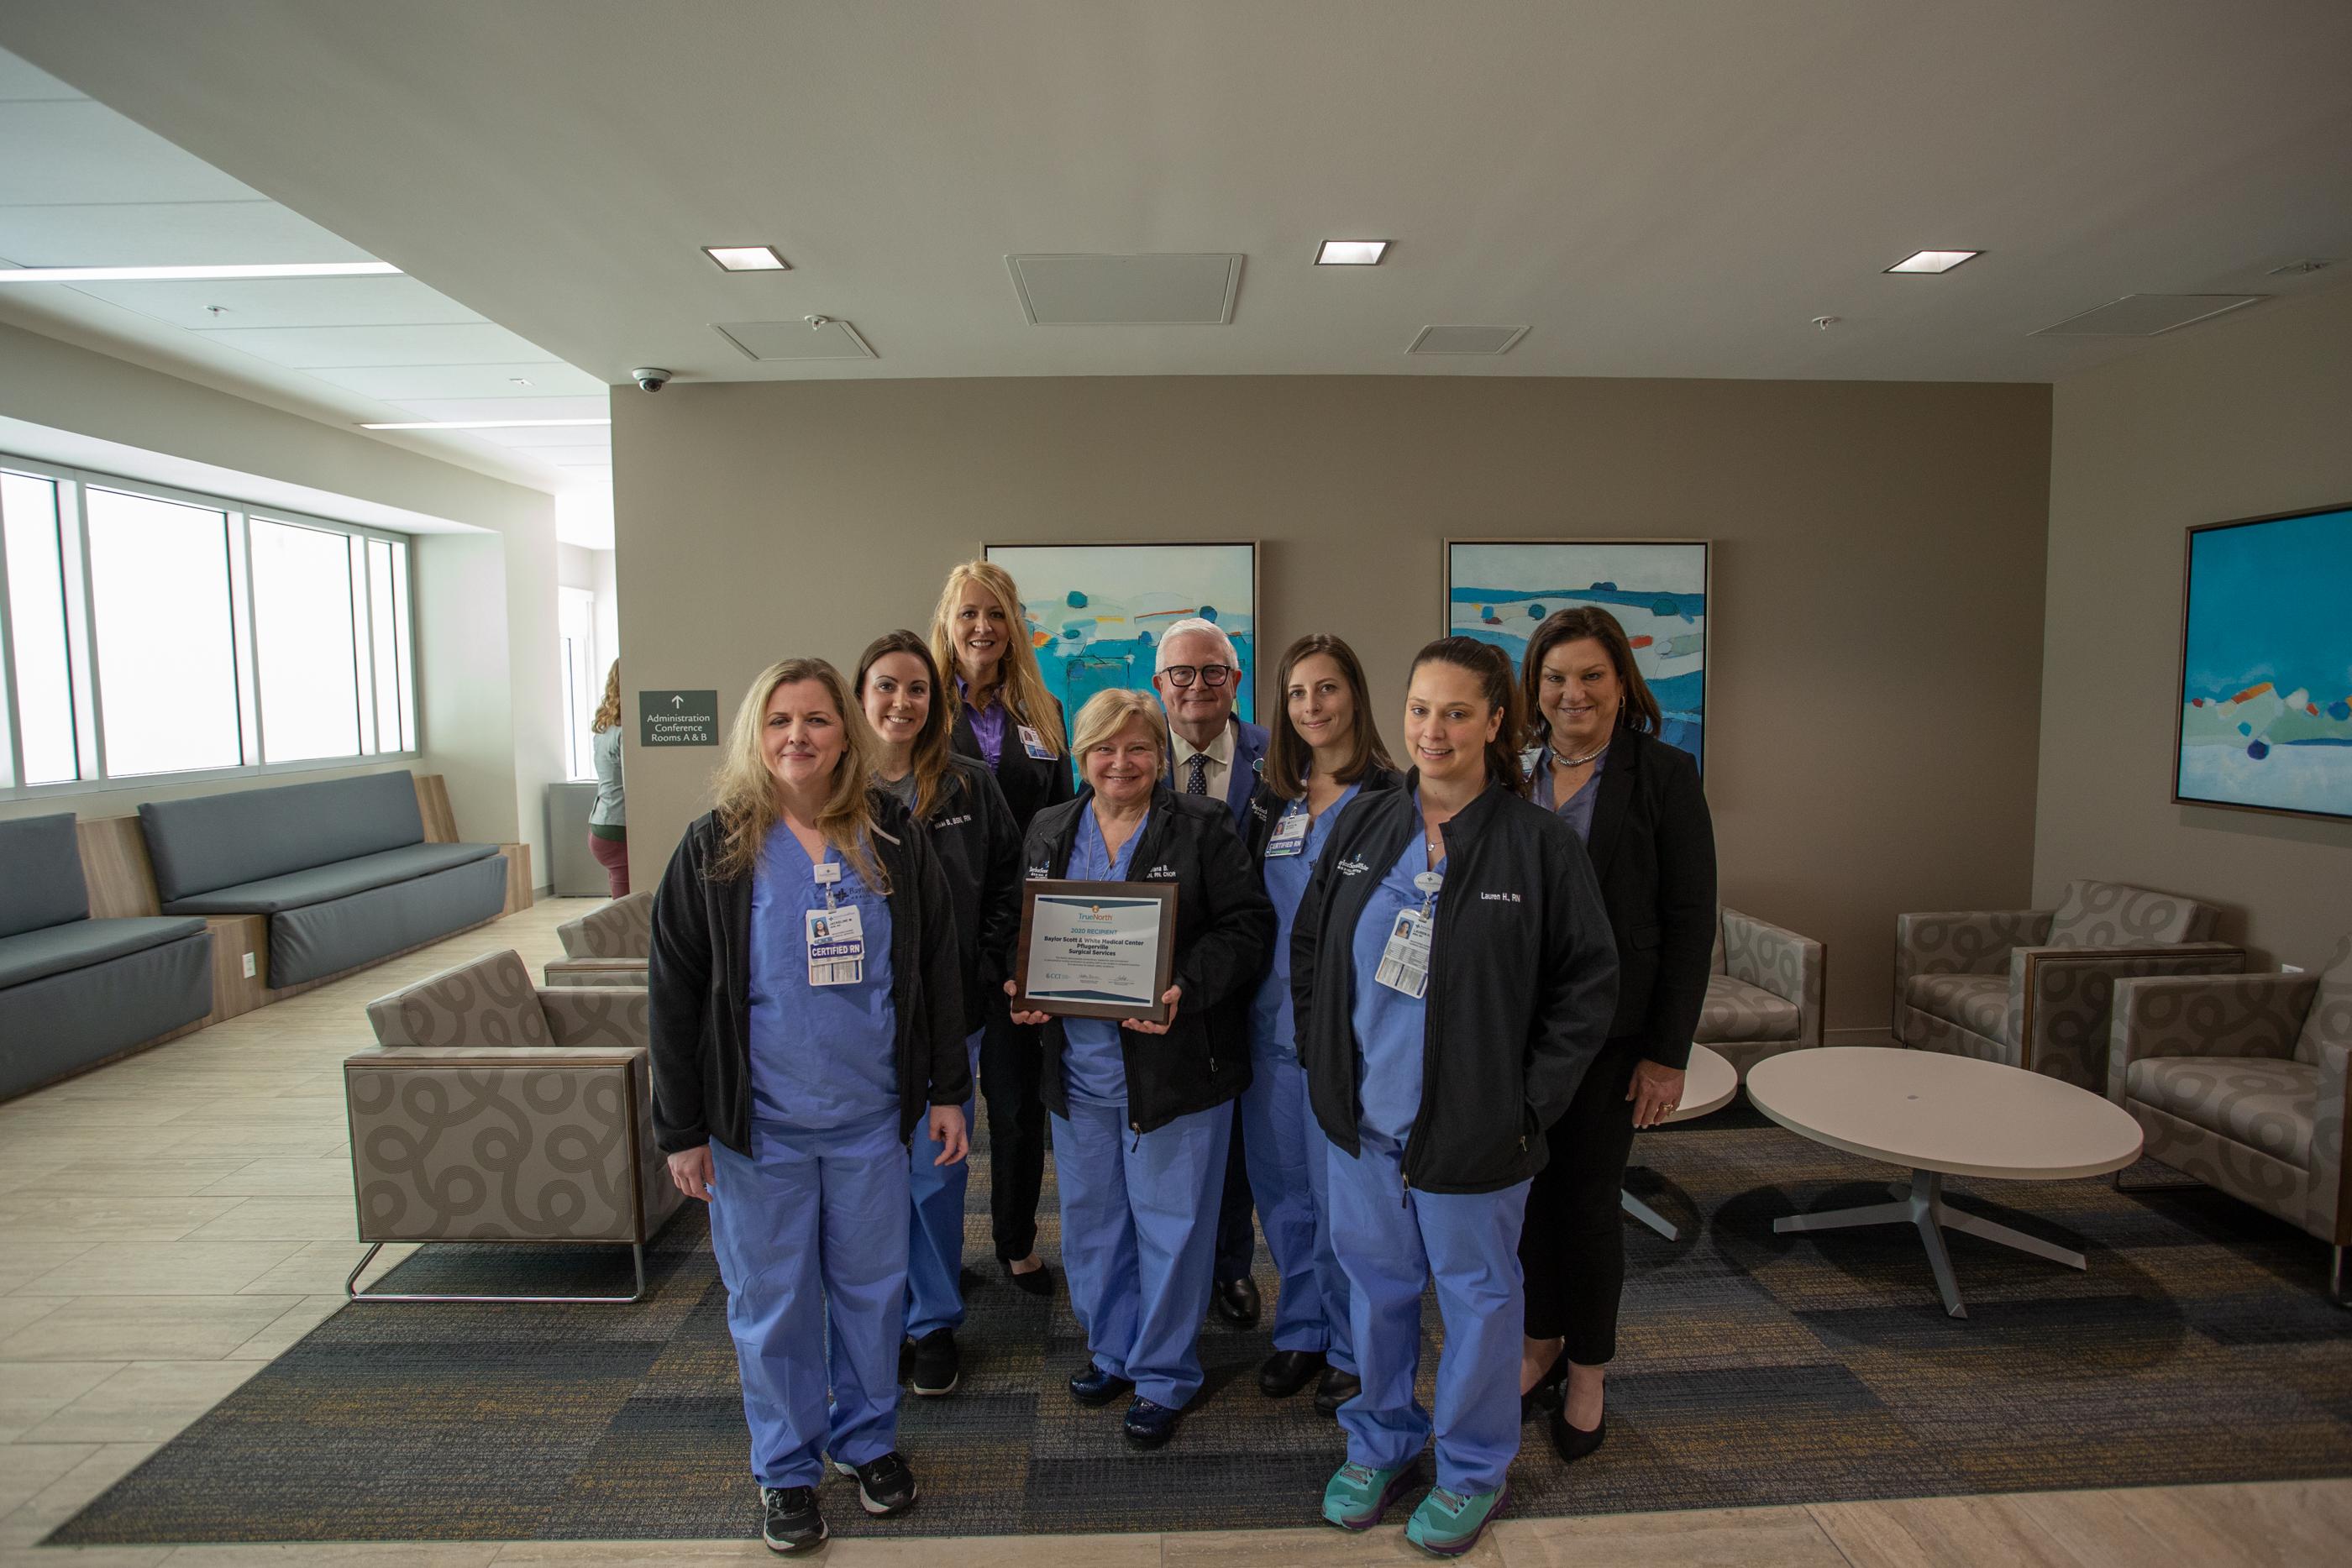 TrueNorth Winner 2020: Baylor Scott & White Medical Center - Pflugerville